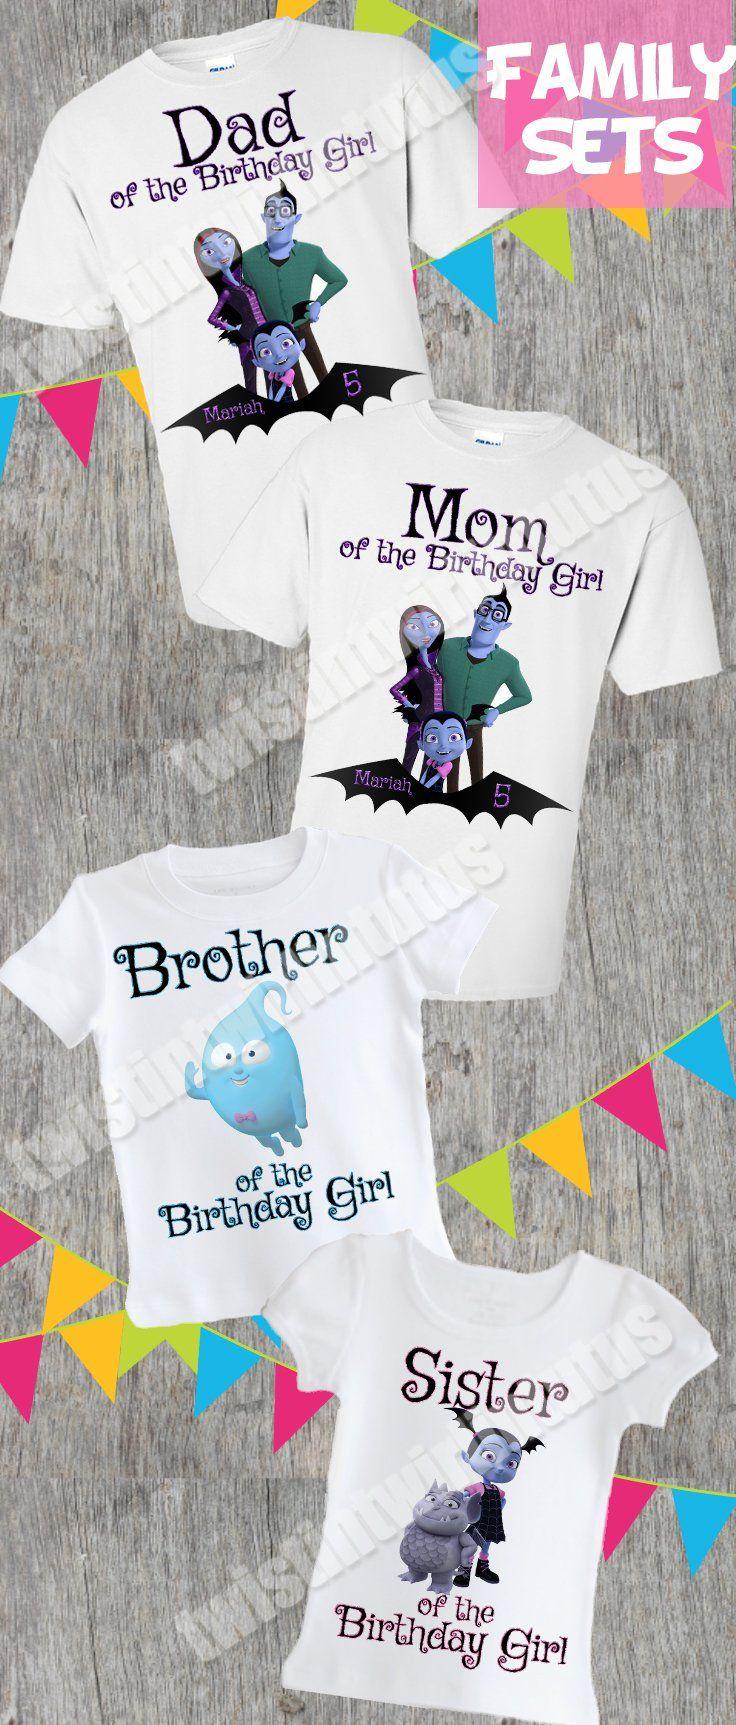 ceedce7ae Vampirina Family Birthday Shirts | Vampirina Birthday Shirts | Vampirina  Birthday Party Ideas | Twistin Twirlin Tutus #twistintwirlintutus ...